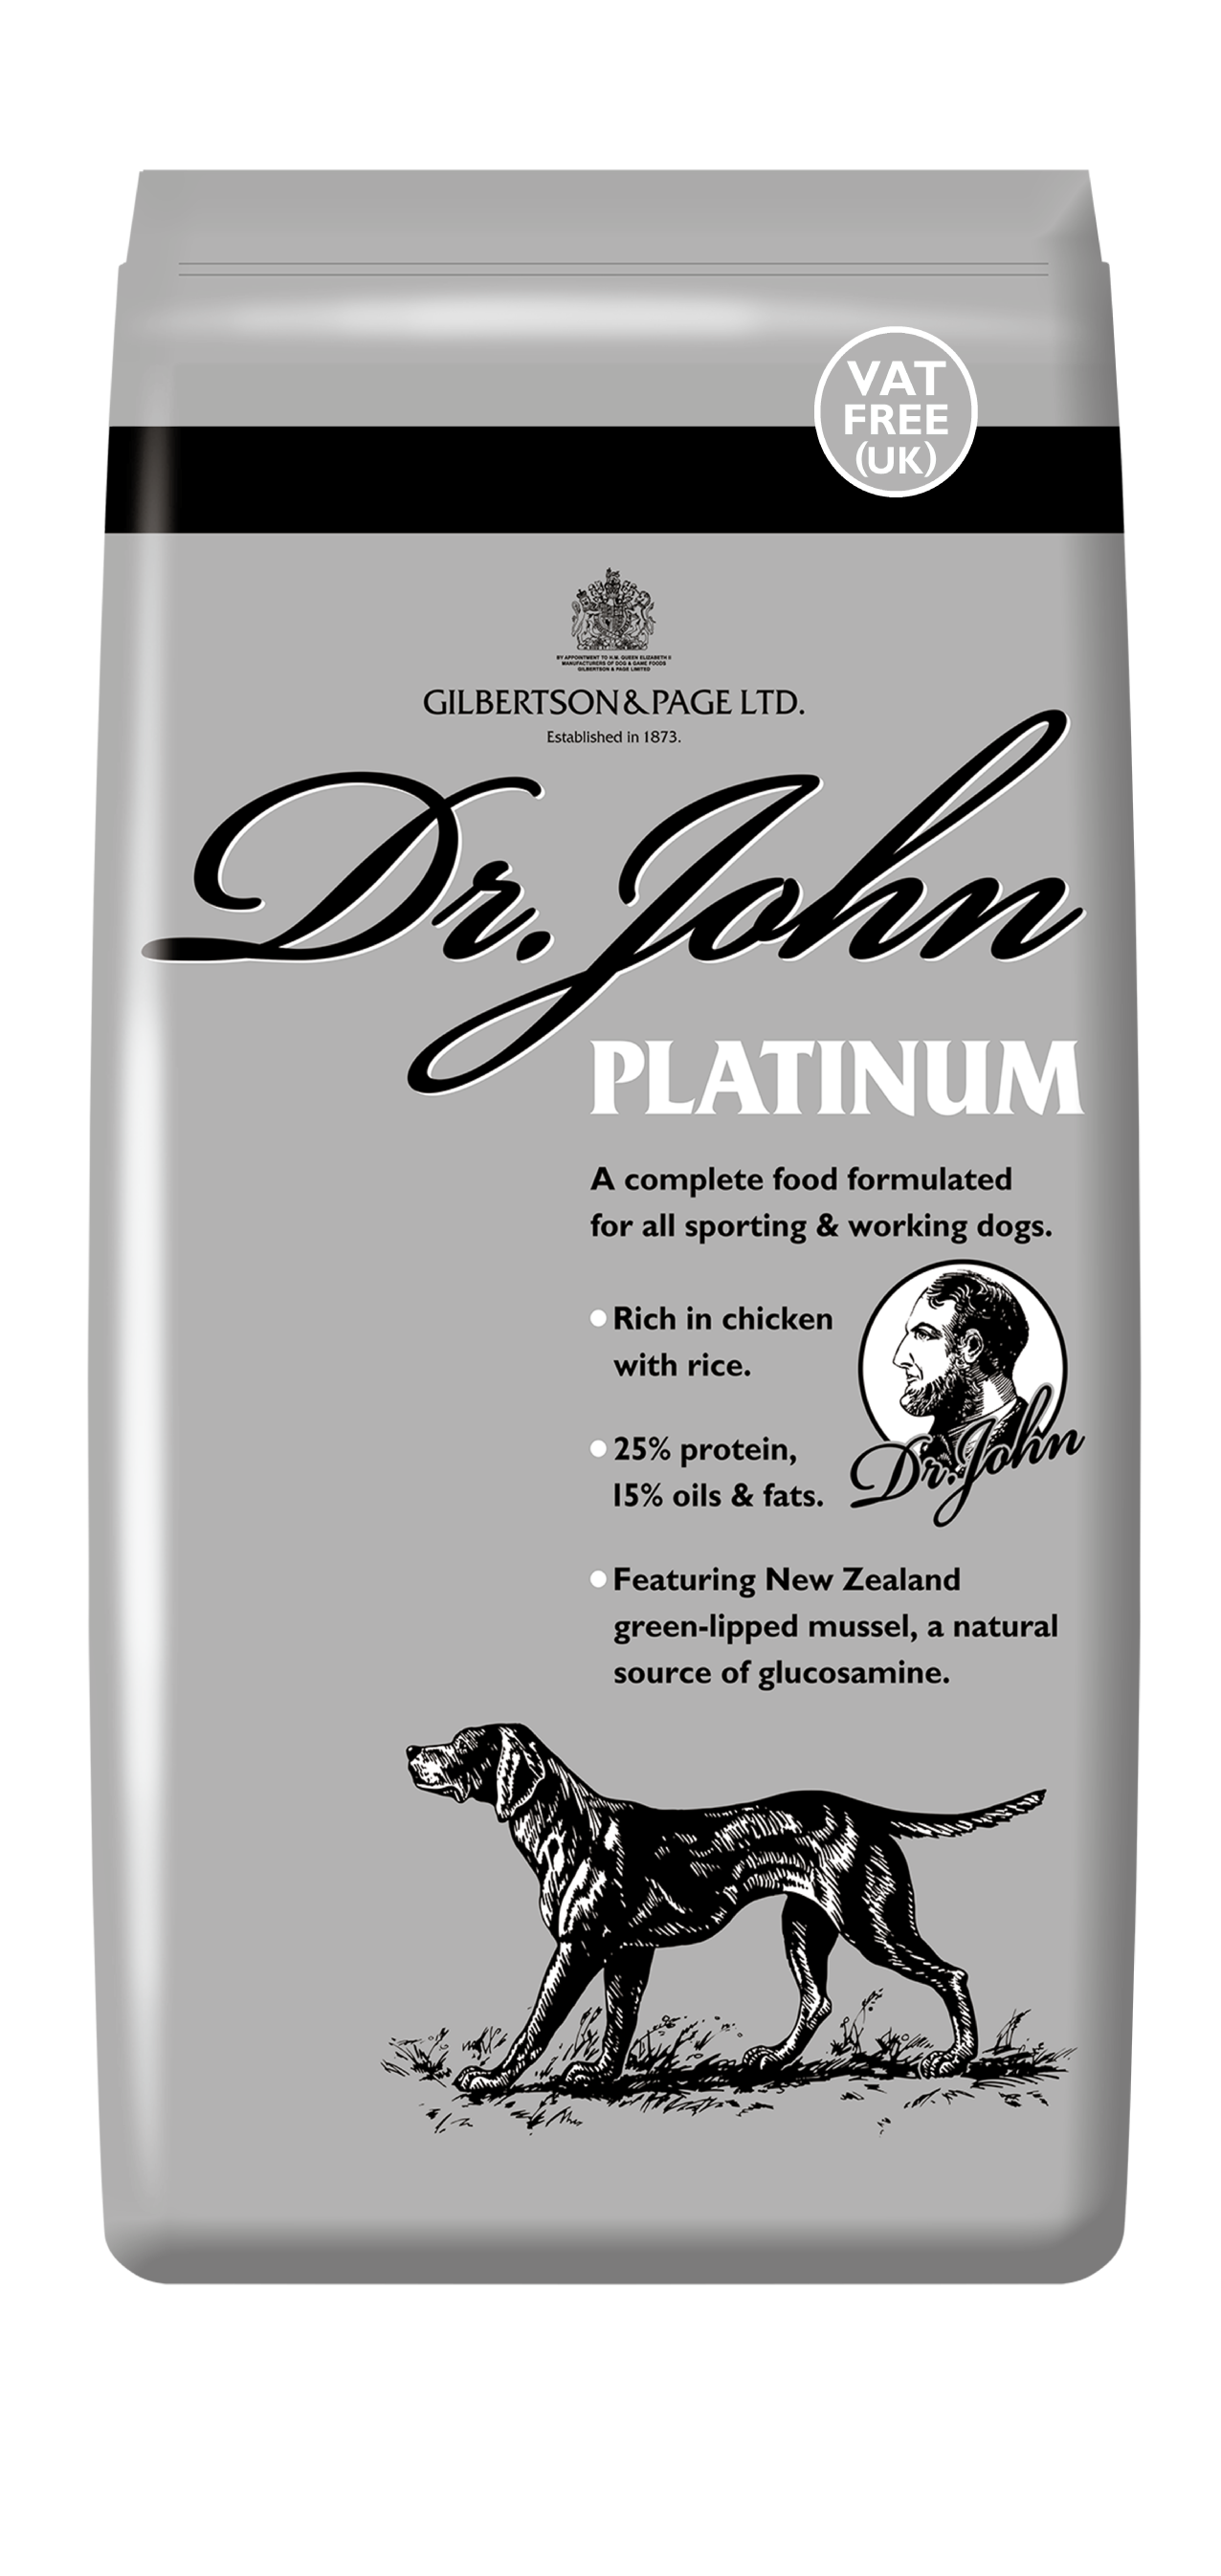 Dr John Platinum Dog Food